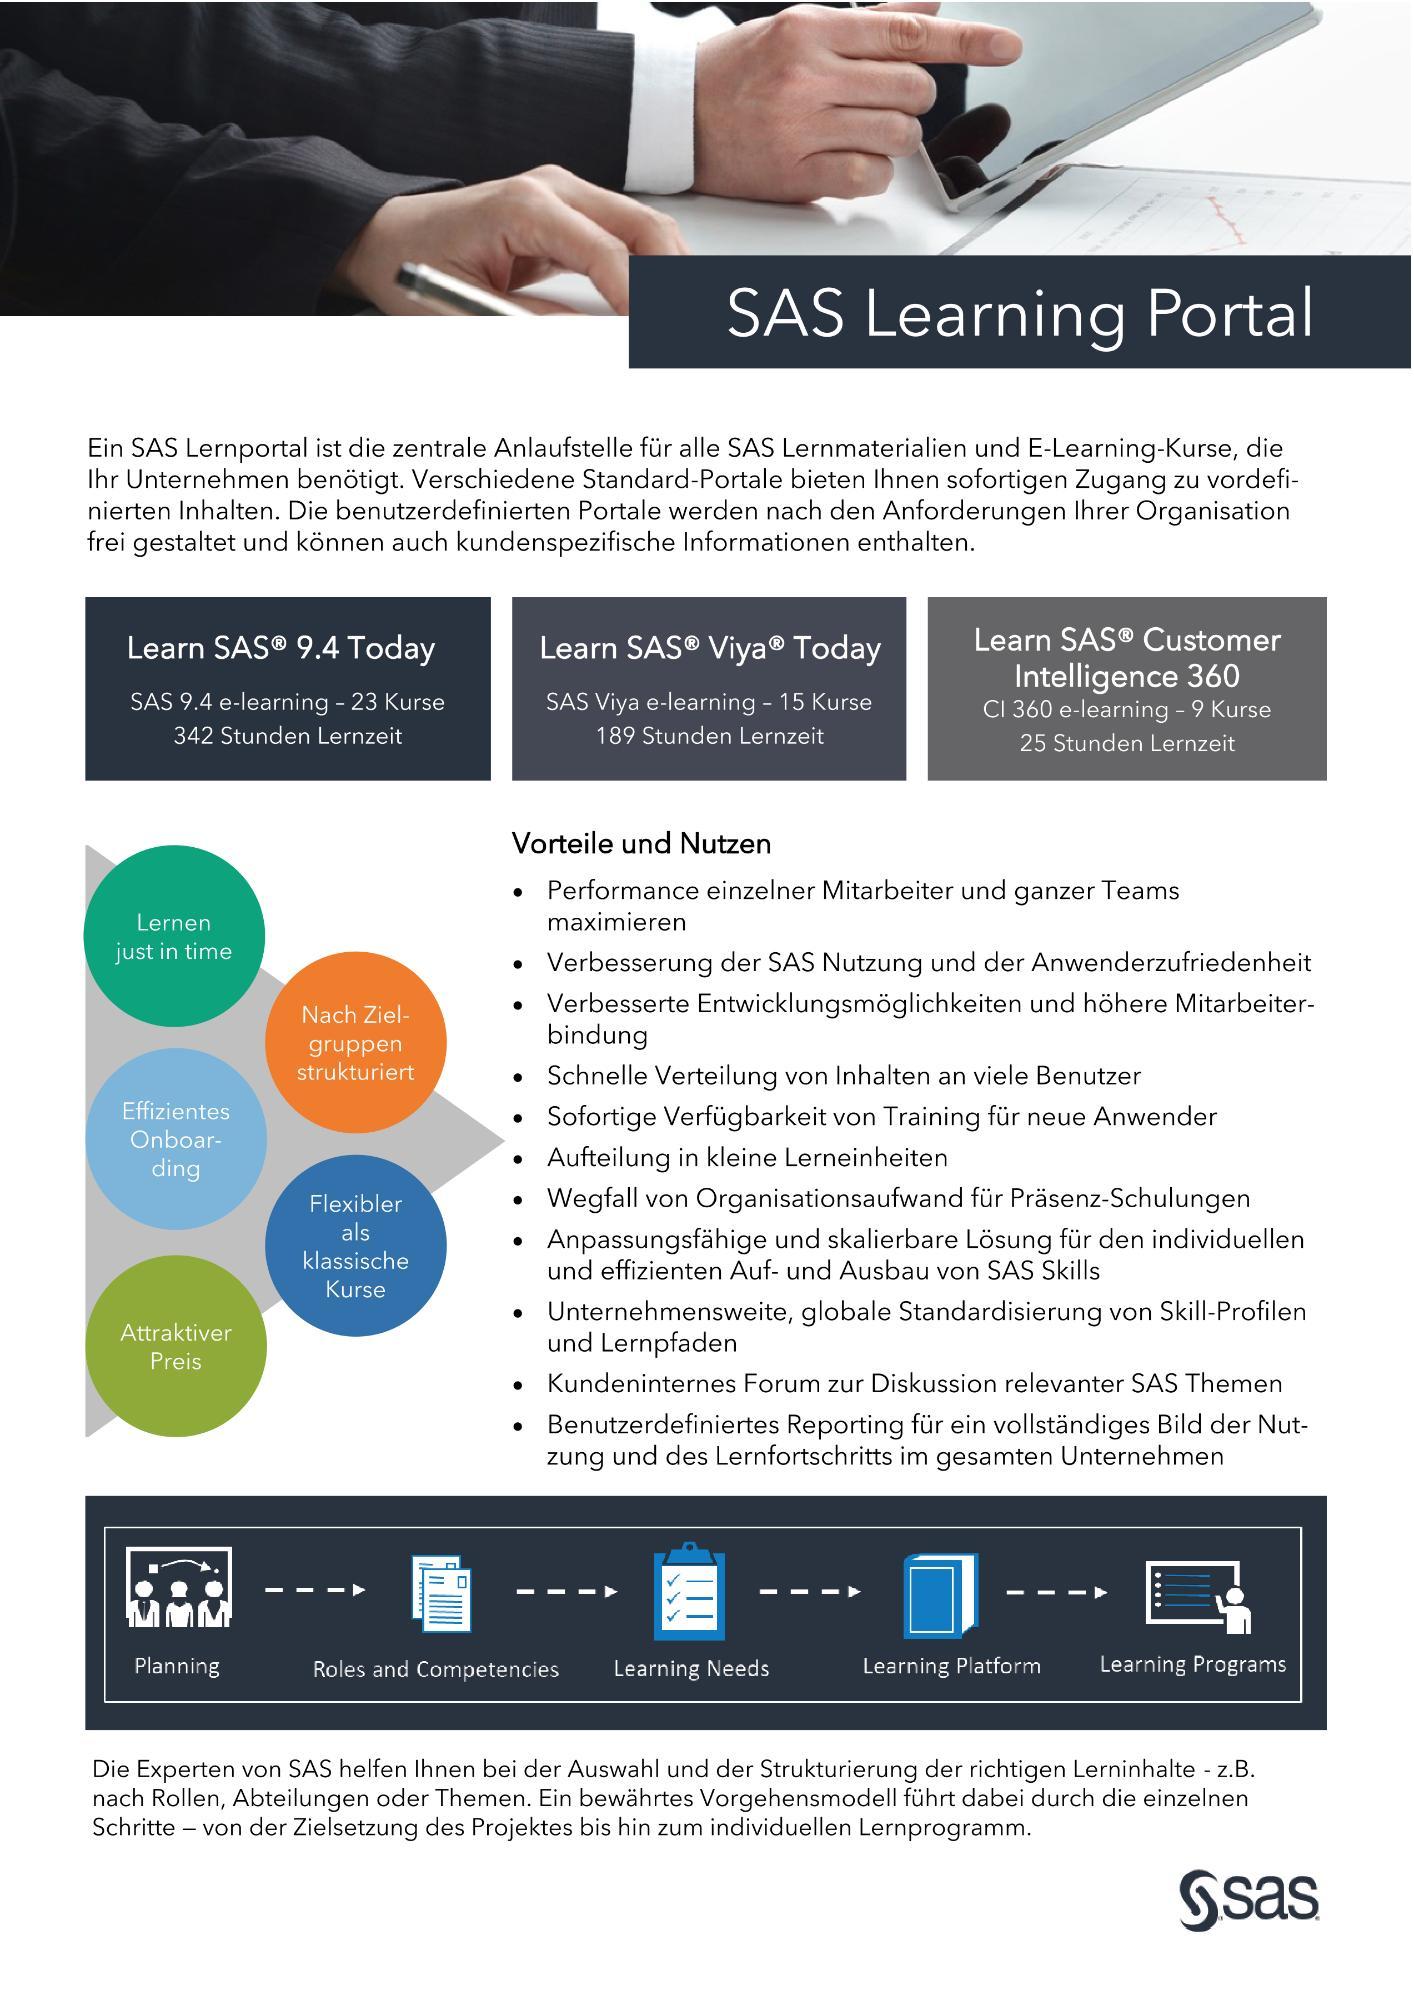 SAS® Learning Portal